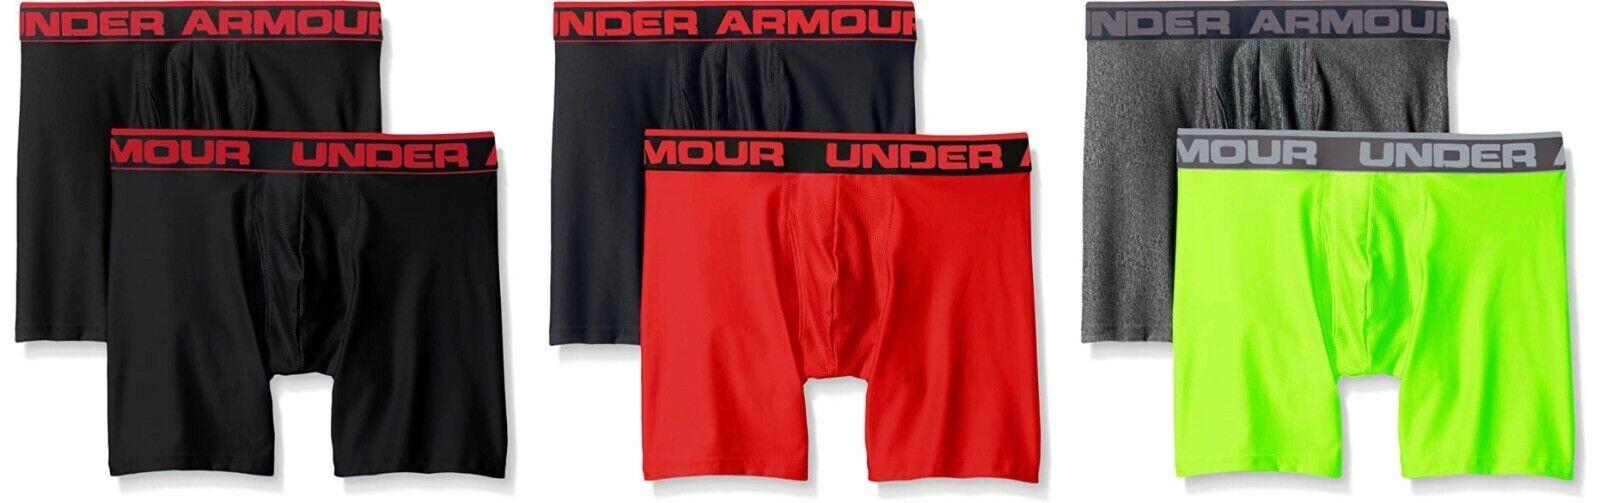 Under Armour UA Original Series Novelty Boxerjock XL Academy